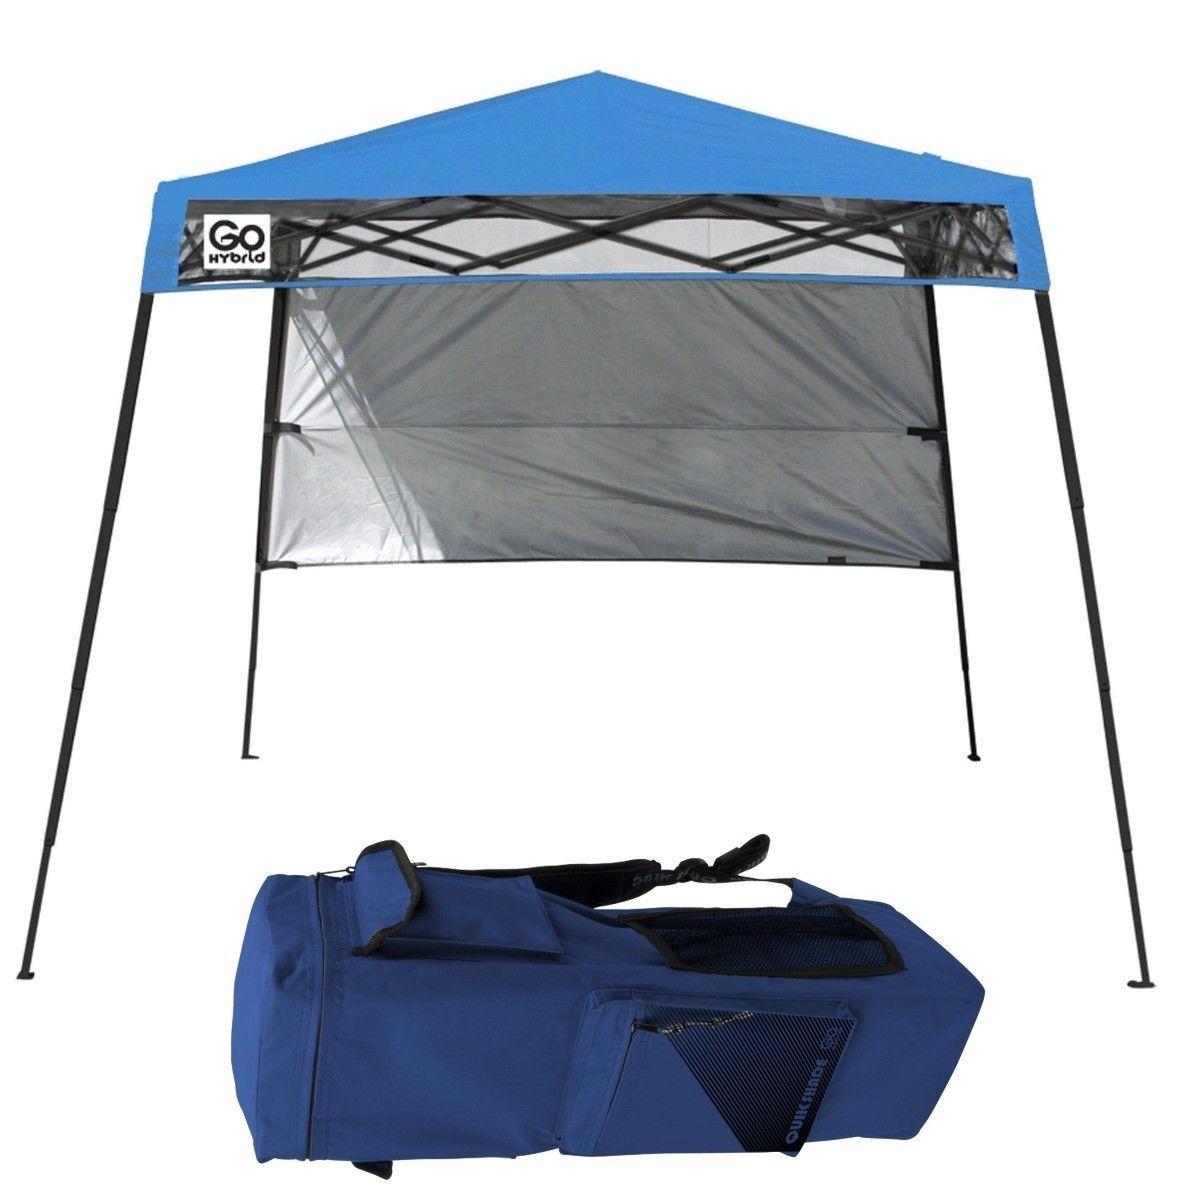 10x10 Gazebo Portable Backpack #Canopy Outdoor Sidewall #Tent Shade Beach Garden  sc 1 st  Pinterest & 10x10 Gazebo Portable Backpack #Canopy Outdoor Sidewall #Tent ...